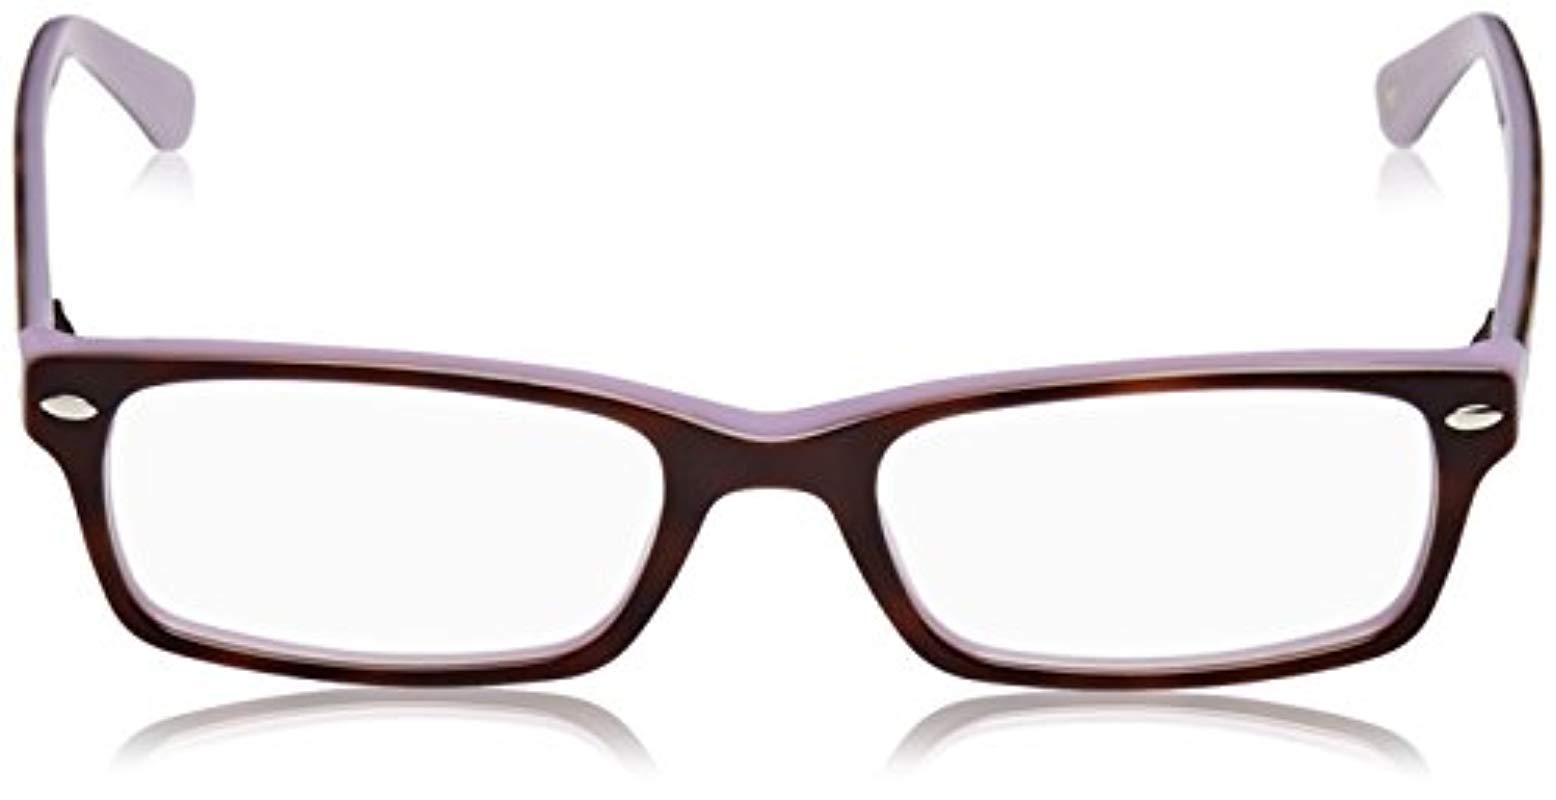 8e1c2747f7 Ray-Ban 0rx 5206 5240 52 Optical Frames